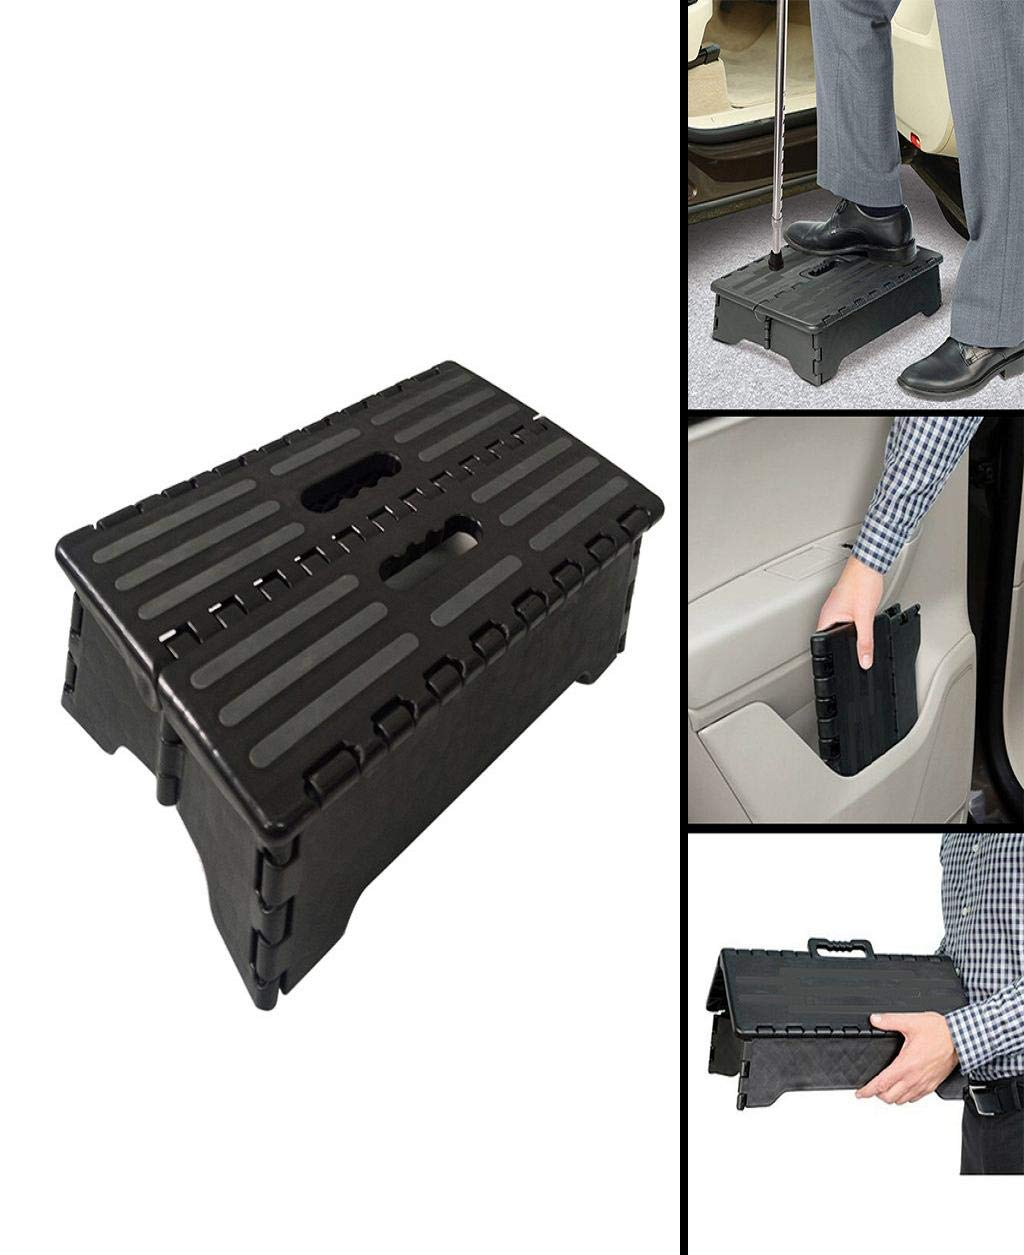 Barlingrock 1 Pc Portable Folding Step Up Stool Car Height Boost Elder Adult Kid Child for Outdoor Door Walking by Barlingrock Home (Image #6)